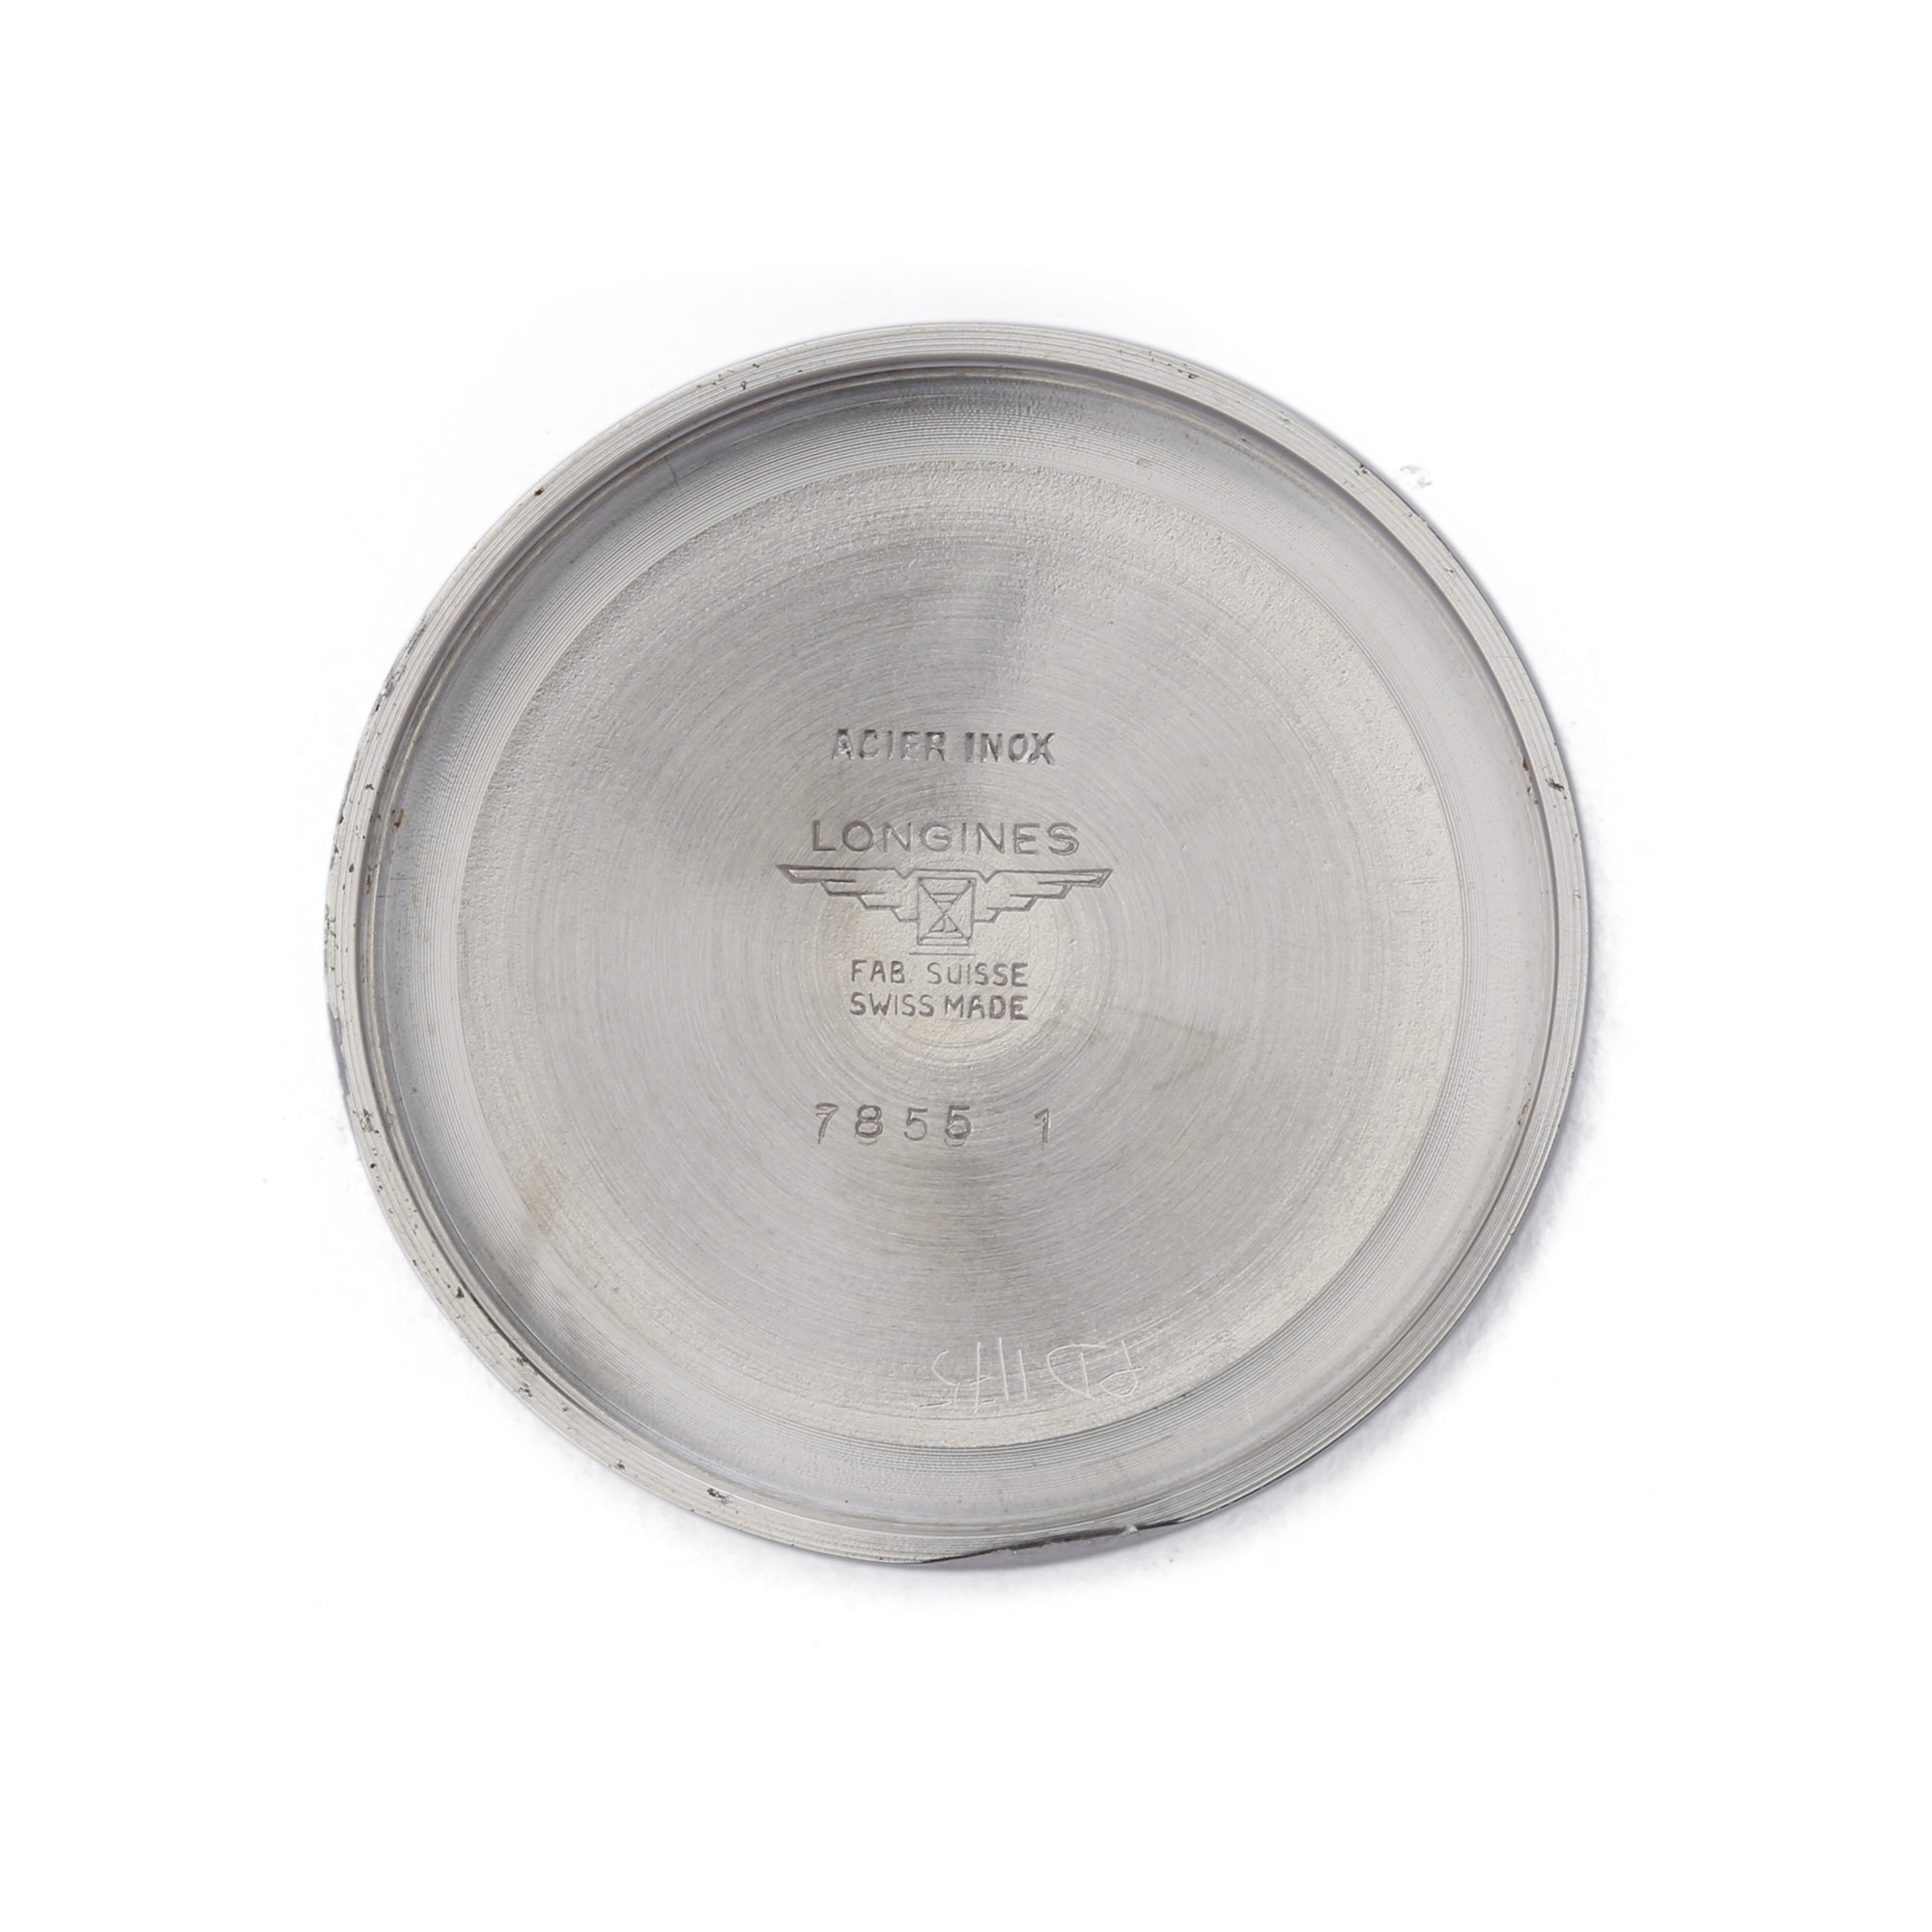 Longines Vintage Roestvrij Staal 78551